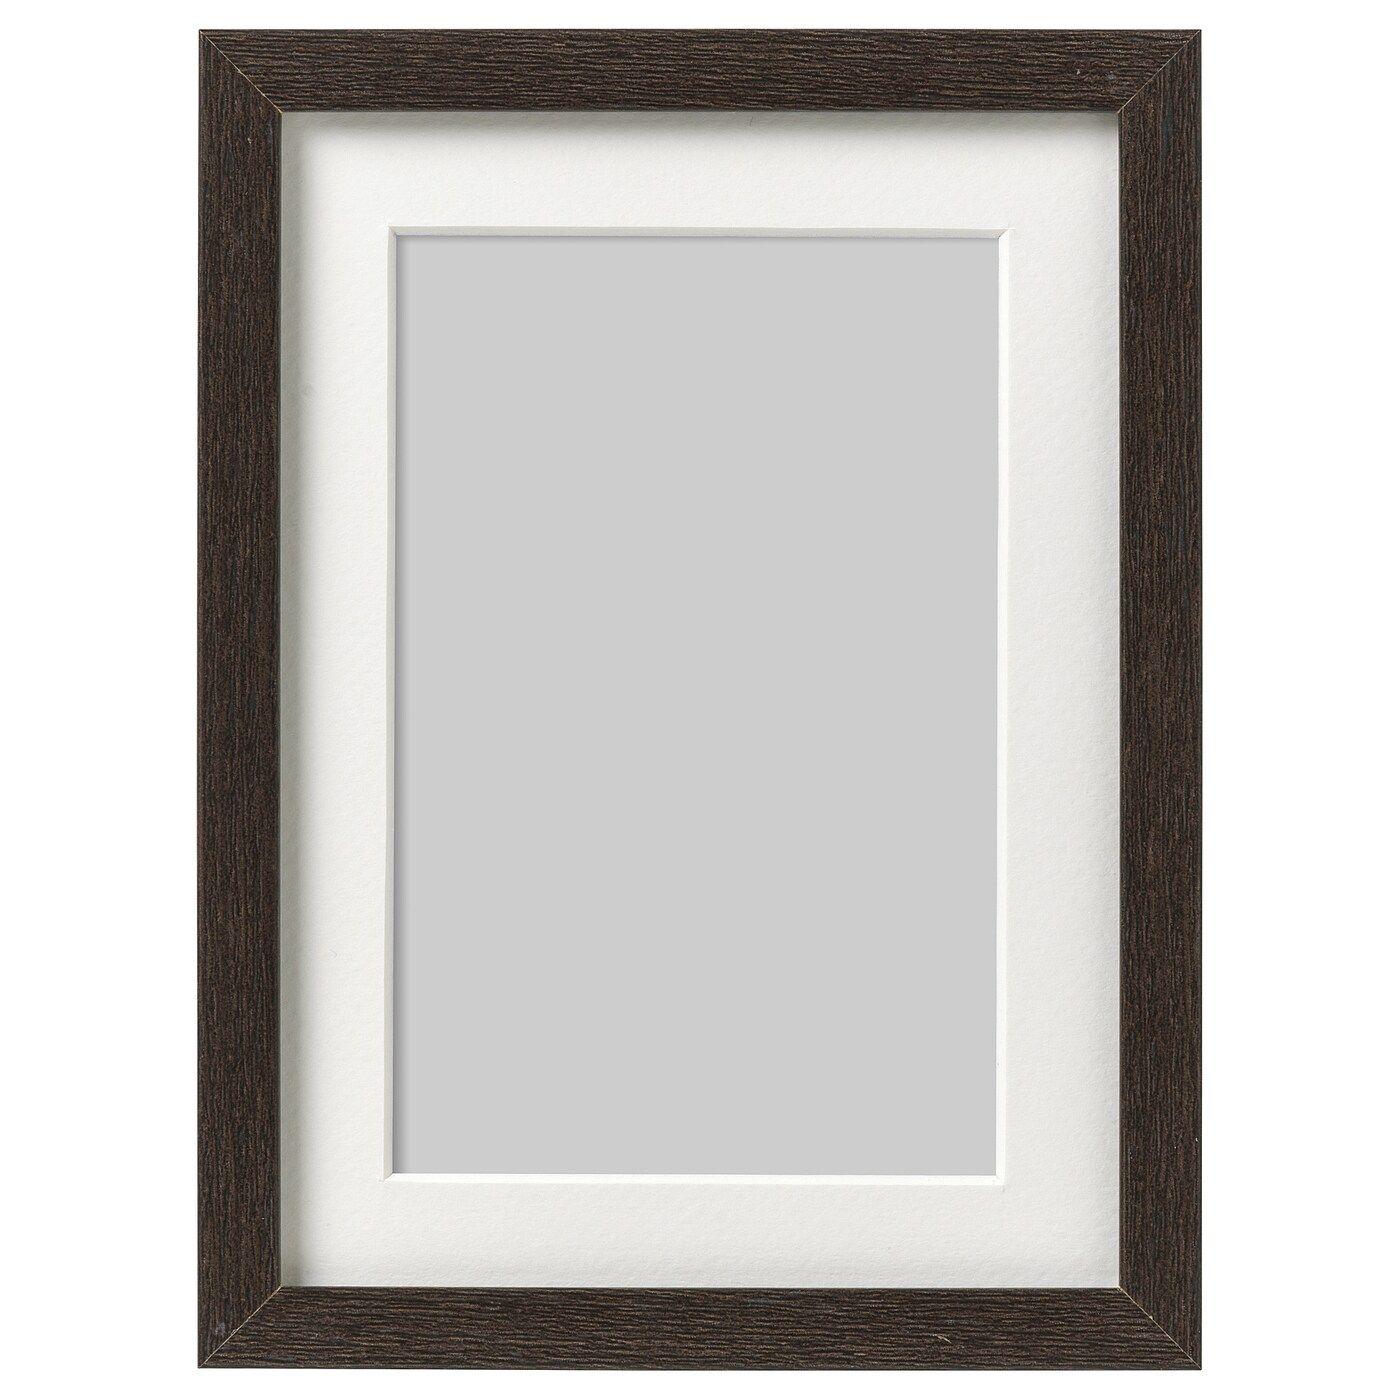 Hovsta Ramme Morkebrun 13x18 Cm Ikea I 2020 Fotoramme Morkebrun Indretningsideer